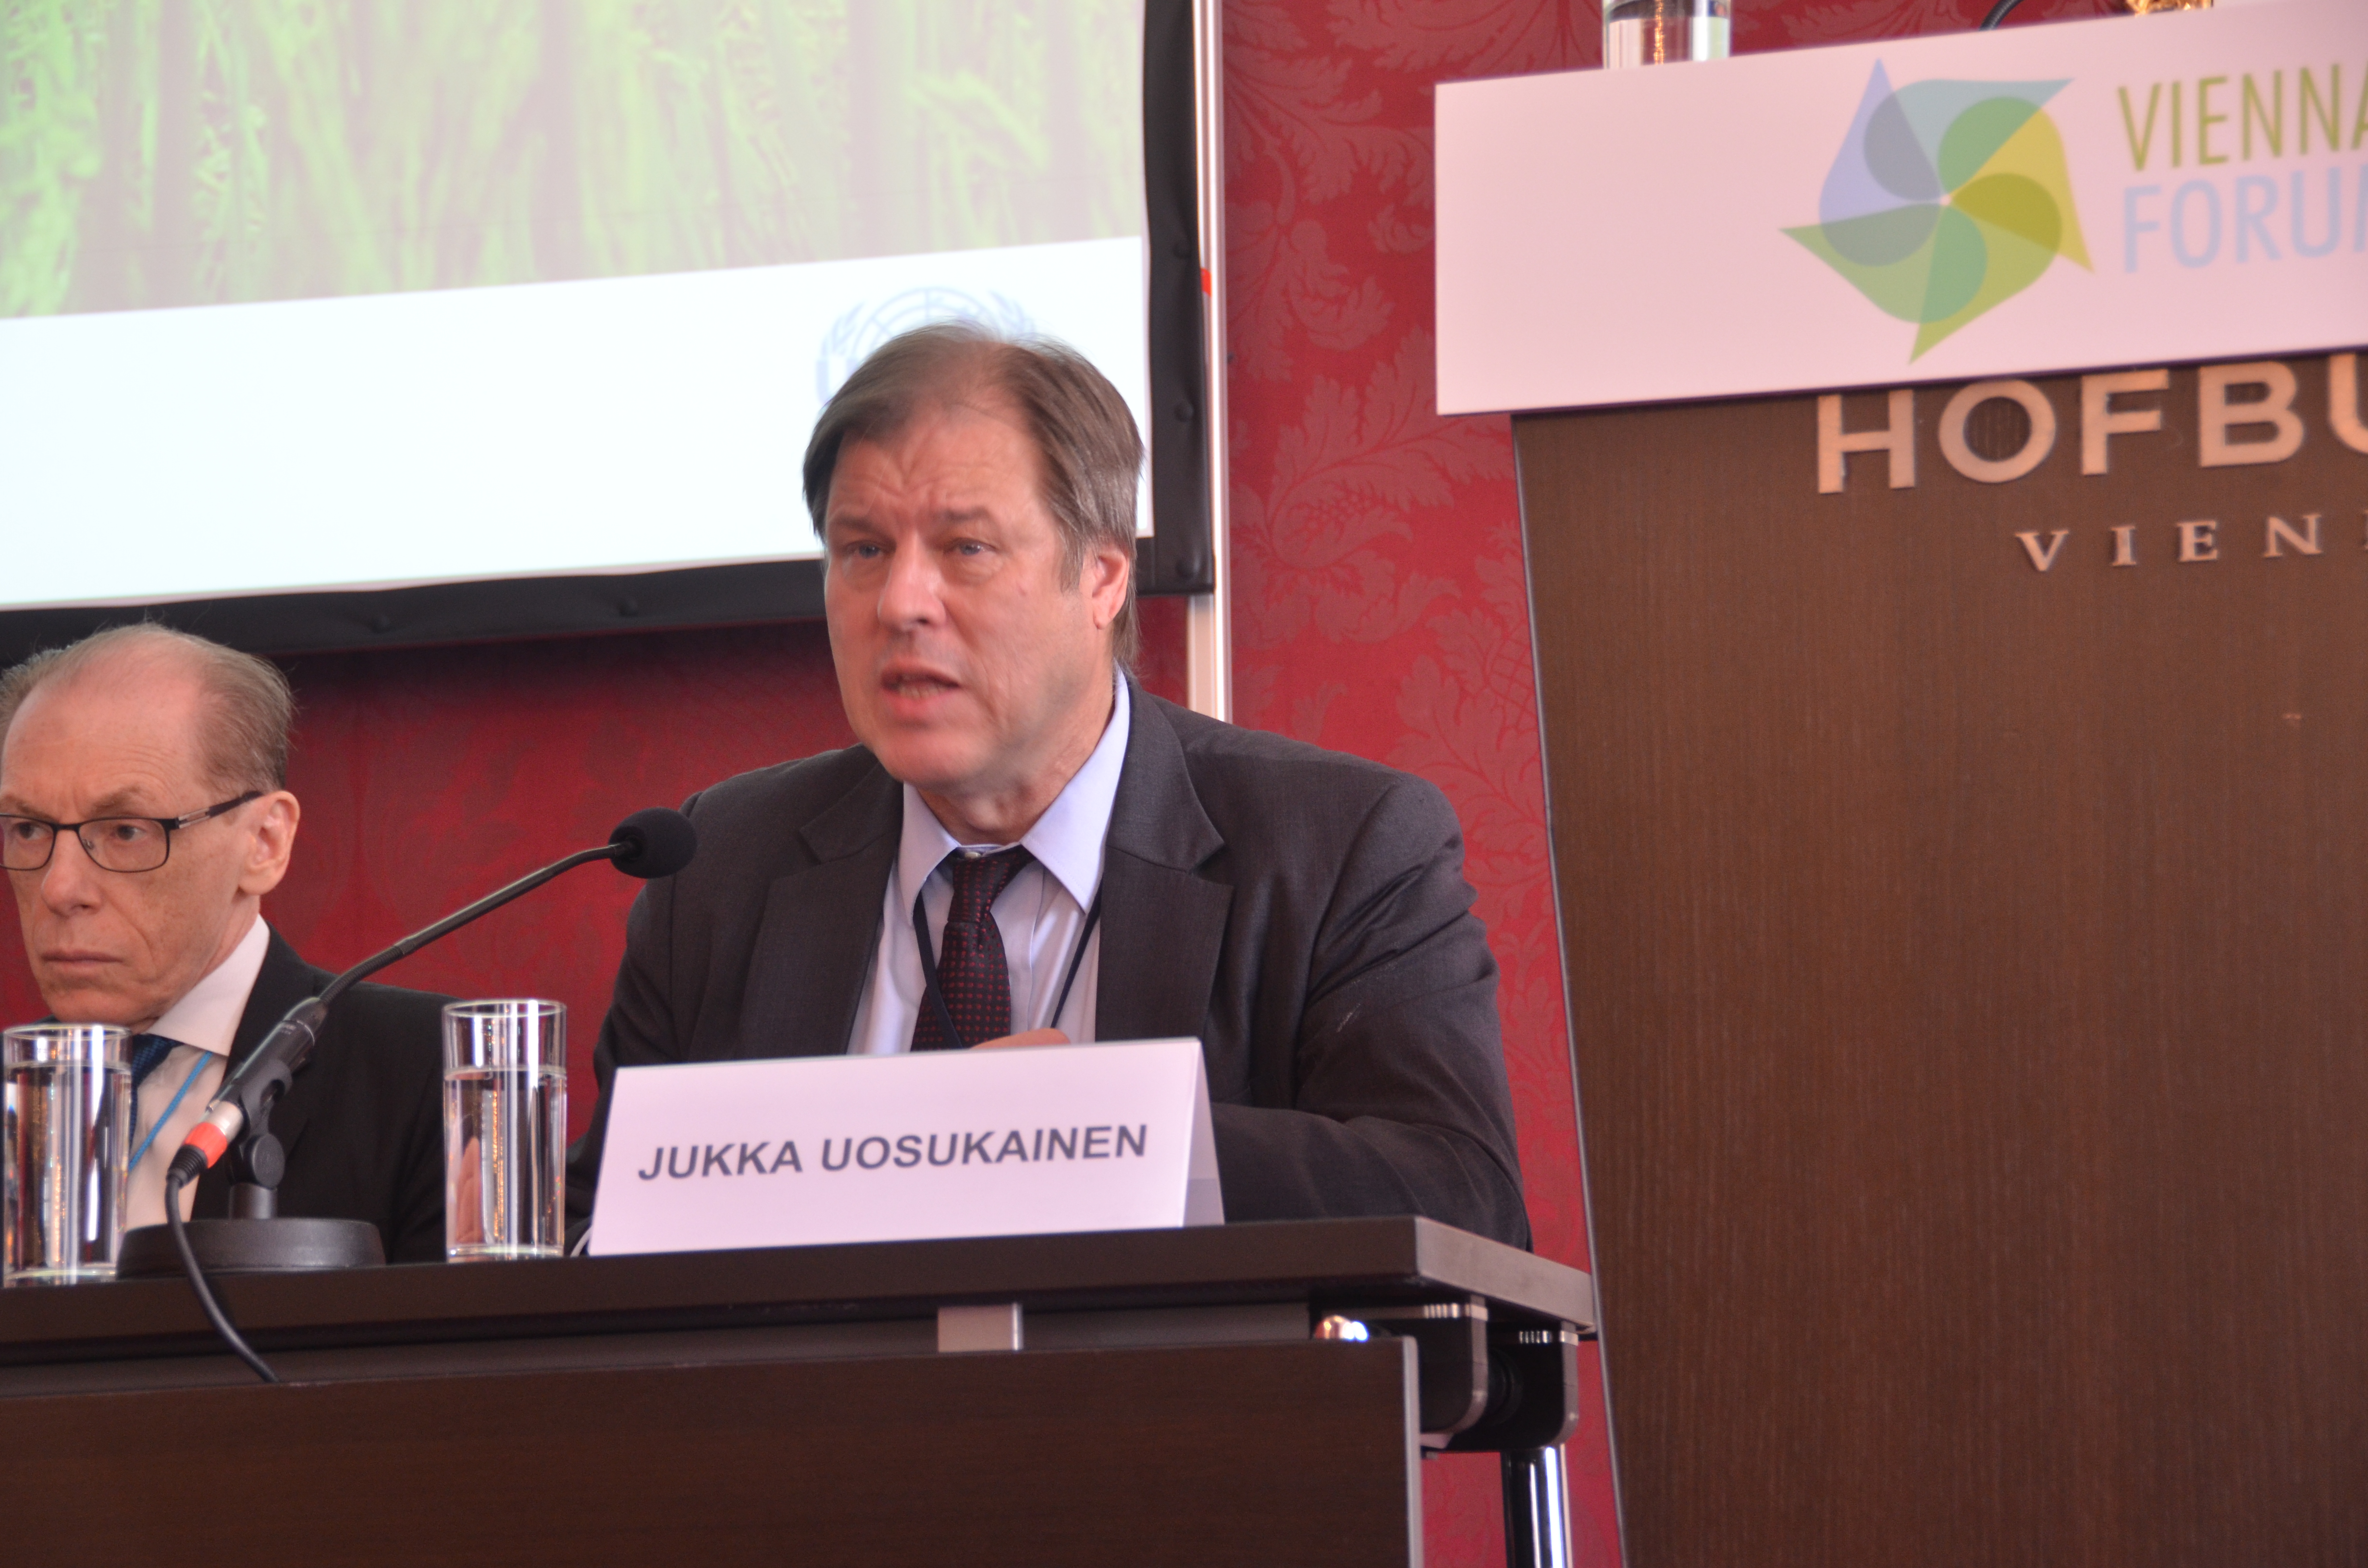 Vienna_Energy_Forum_2015 116.JPG